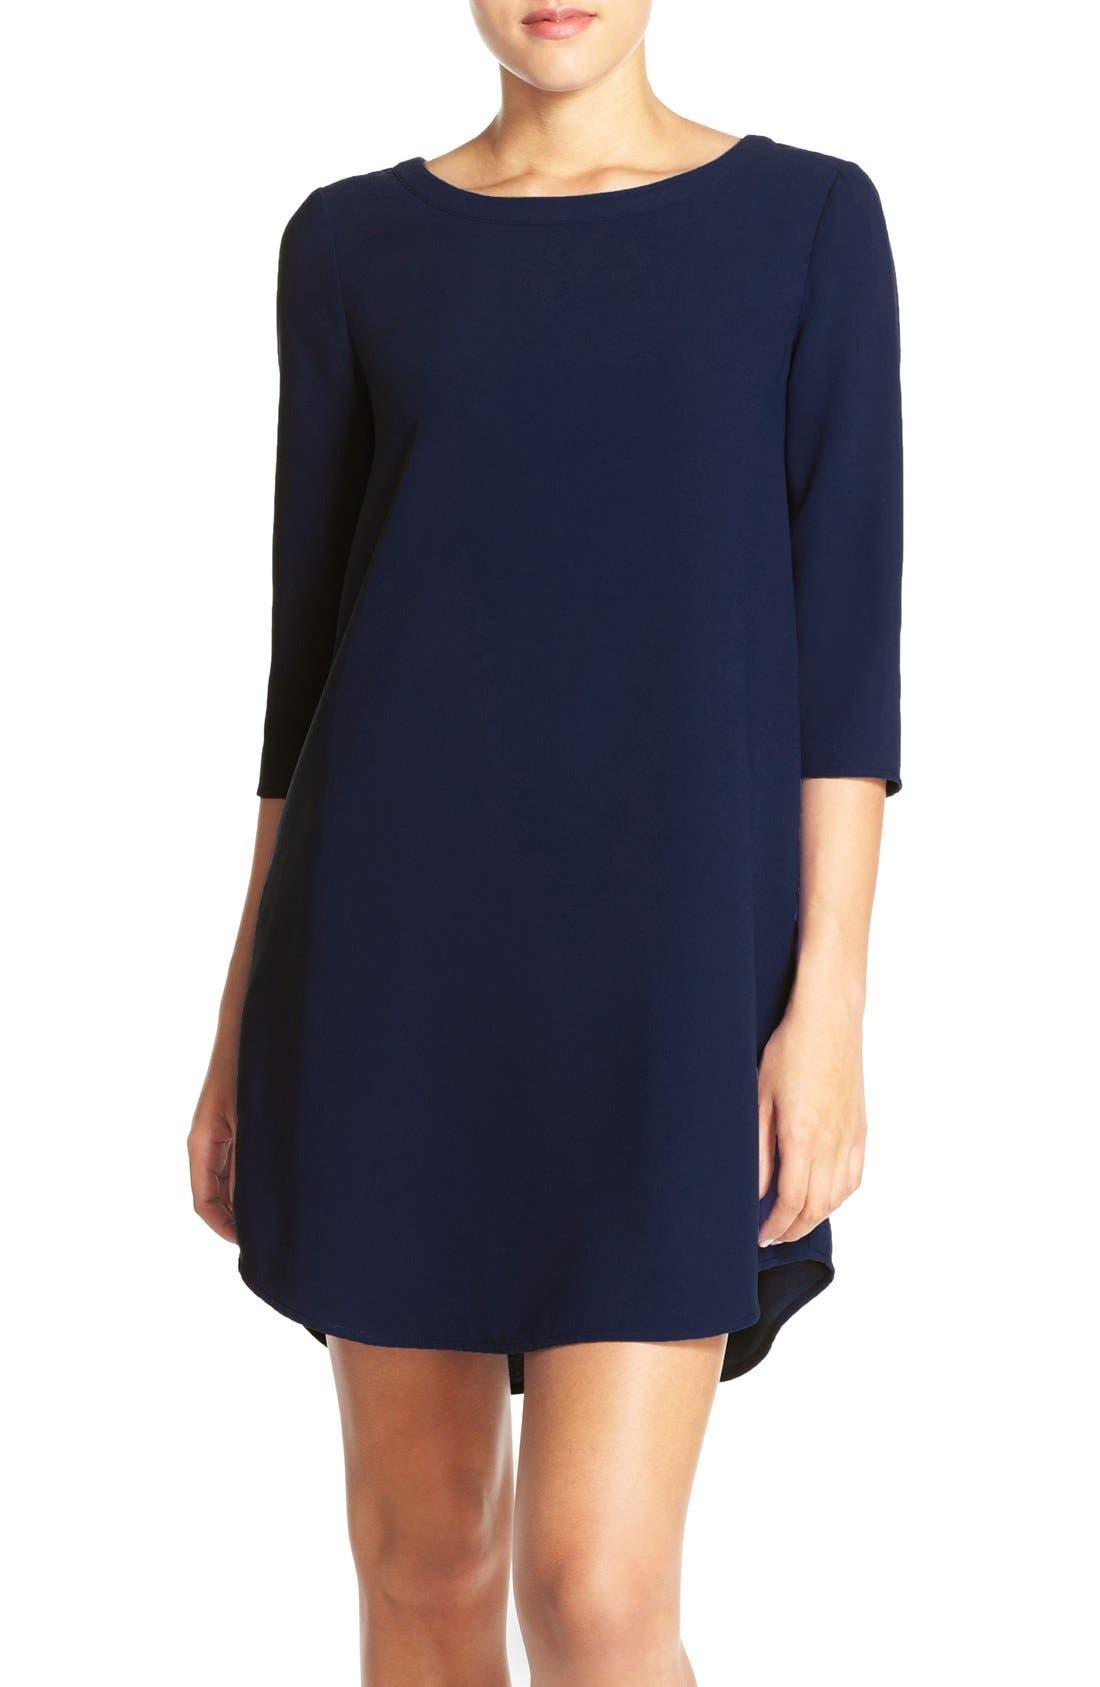 Alternate Image 1 Selected - BB Dakota 'Jazlyn' Crepe Shift Dress